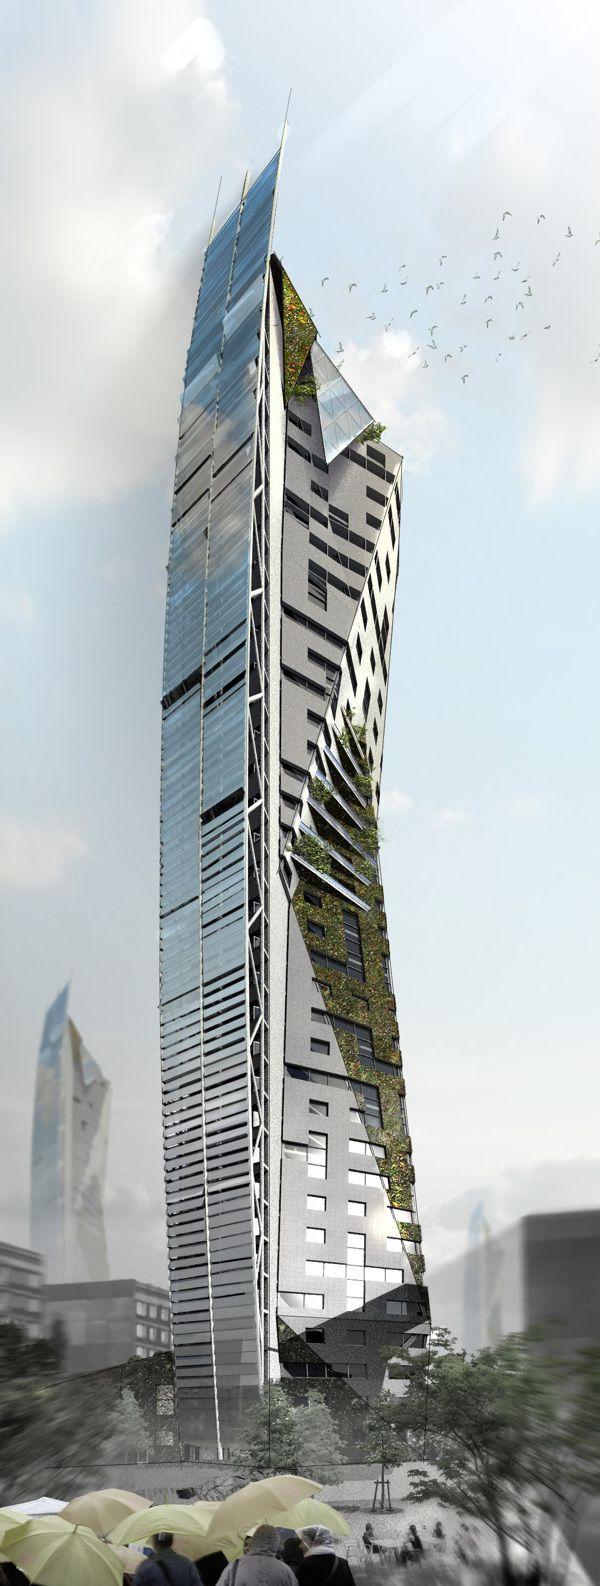 Architecture Eco Tower, Kiev, Ukraine by Pavlo Kryvozub